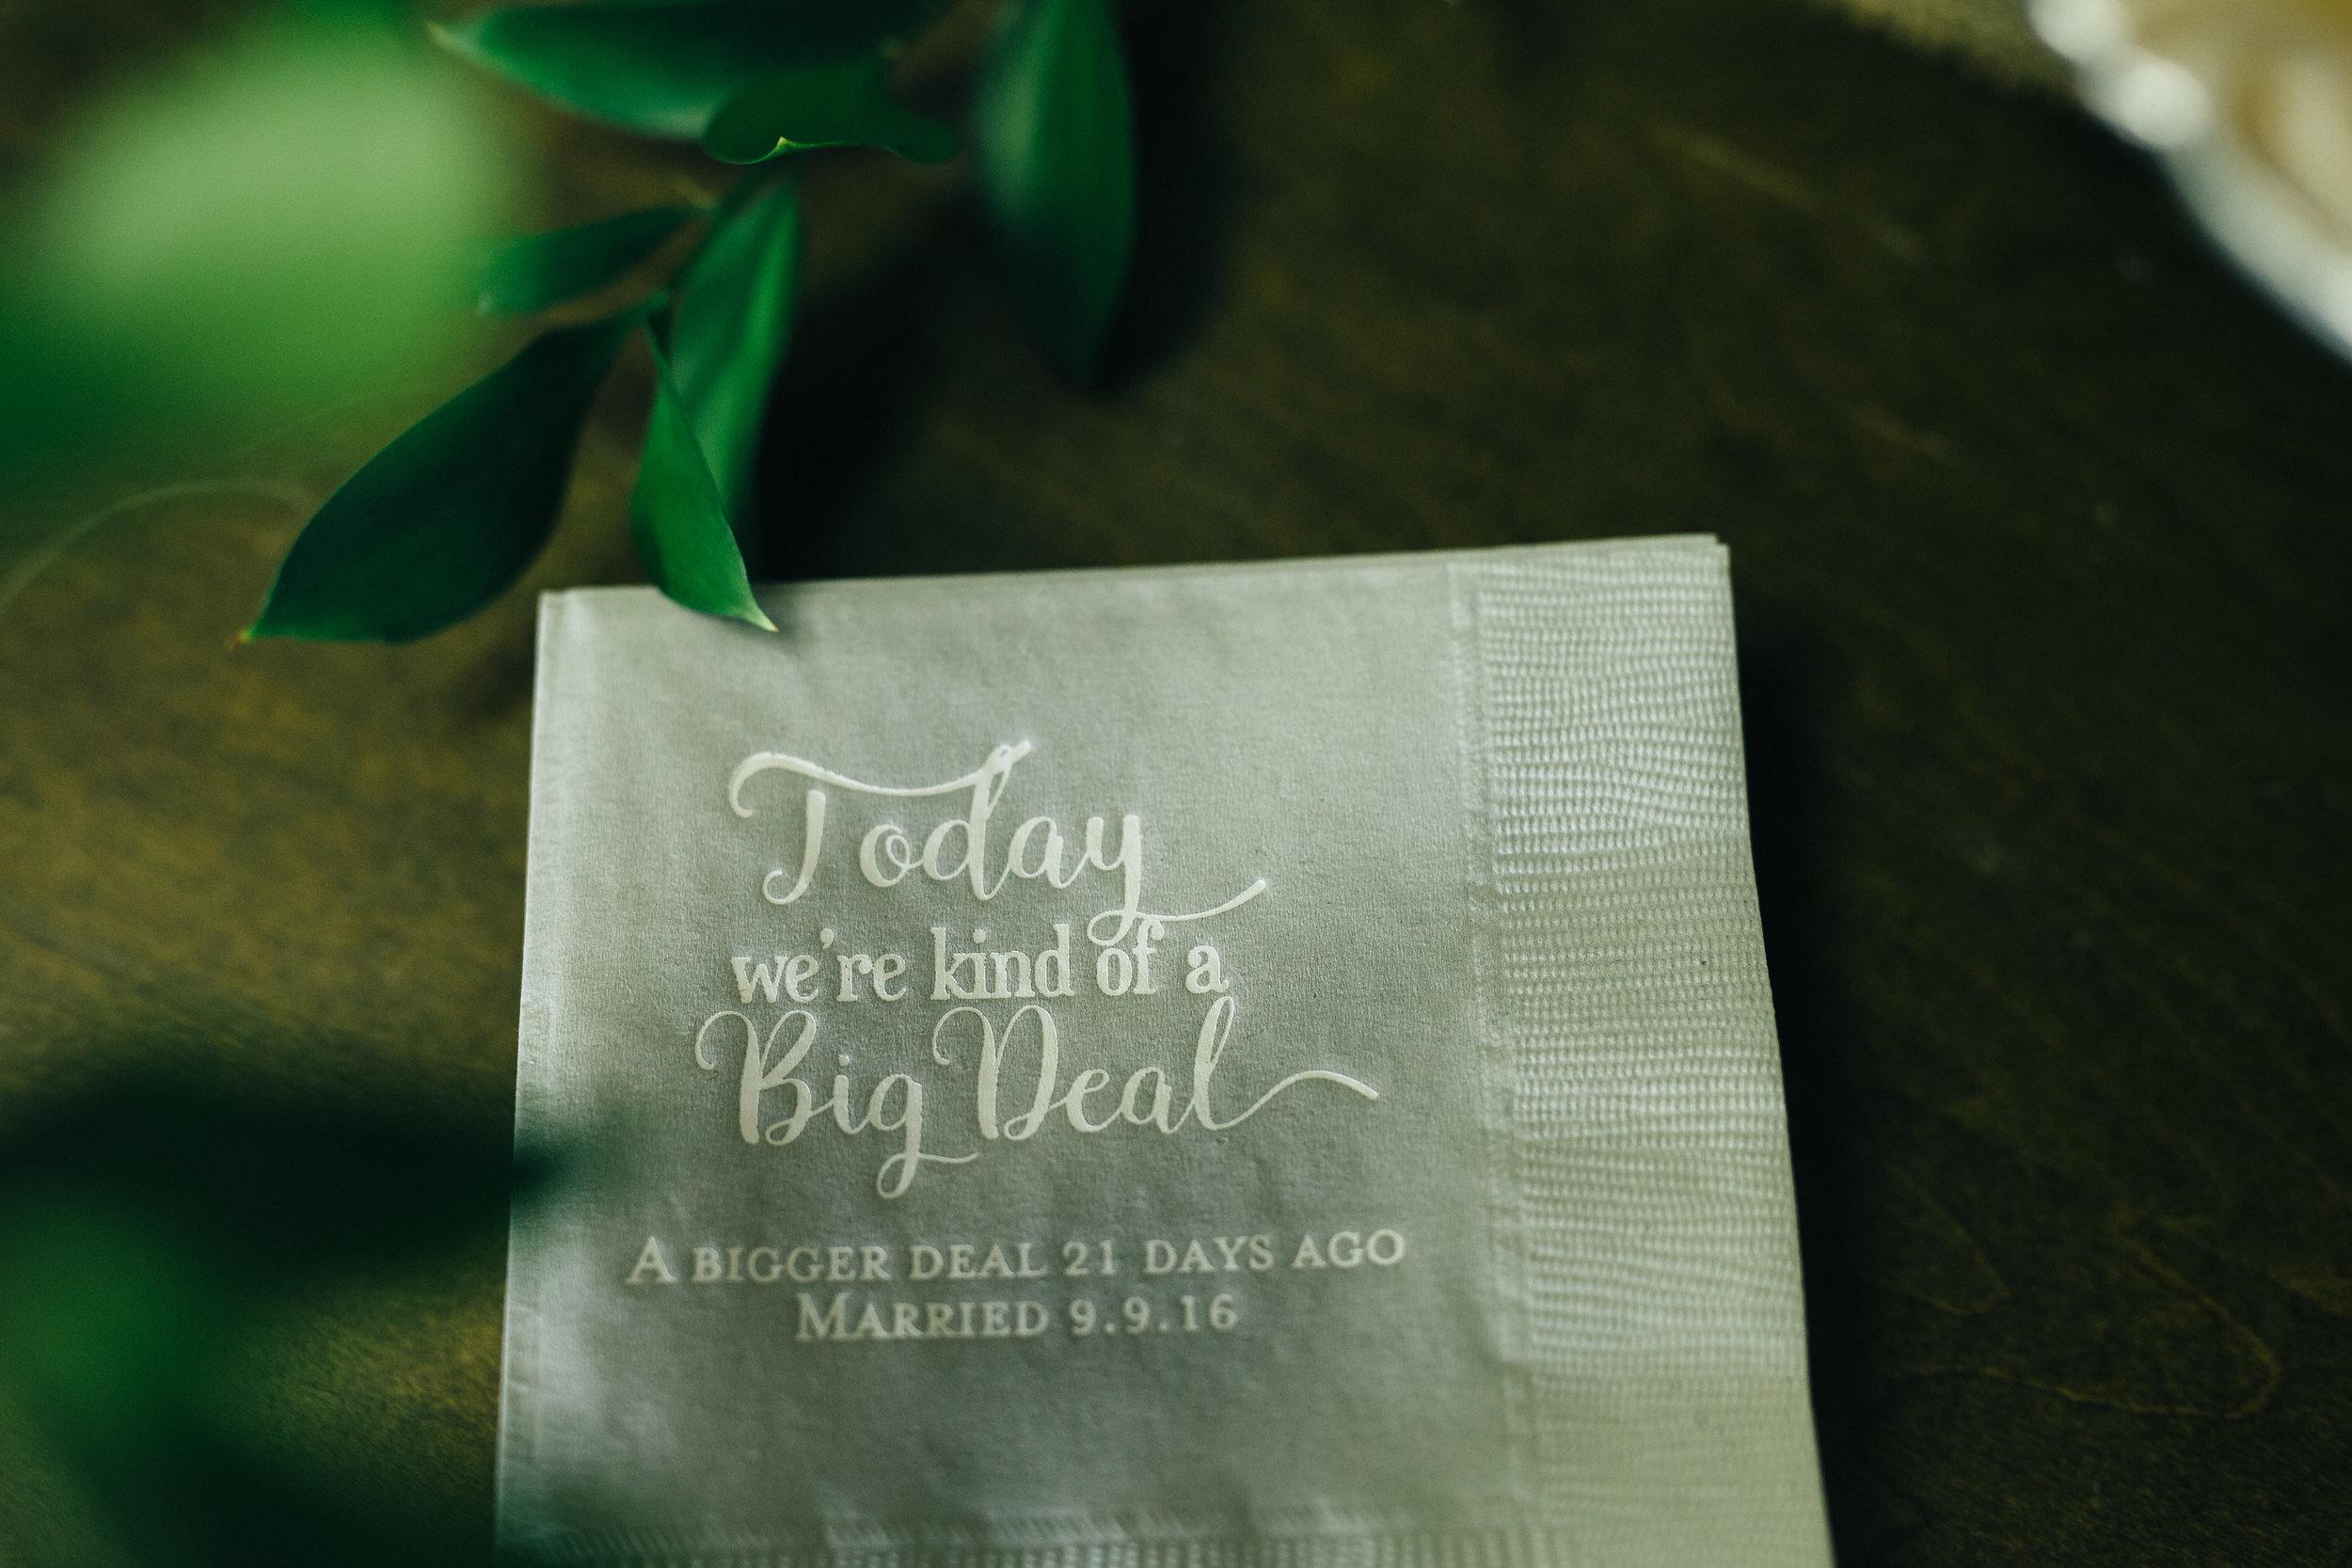 Custom napkins at wedding reception.